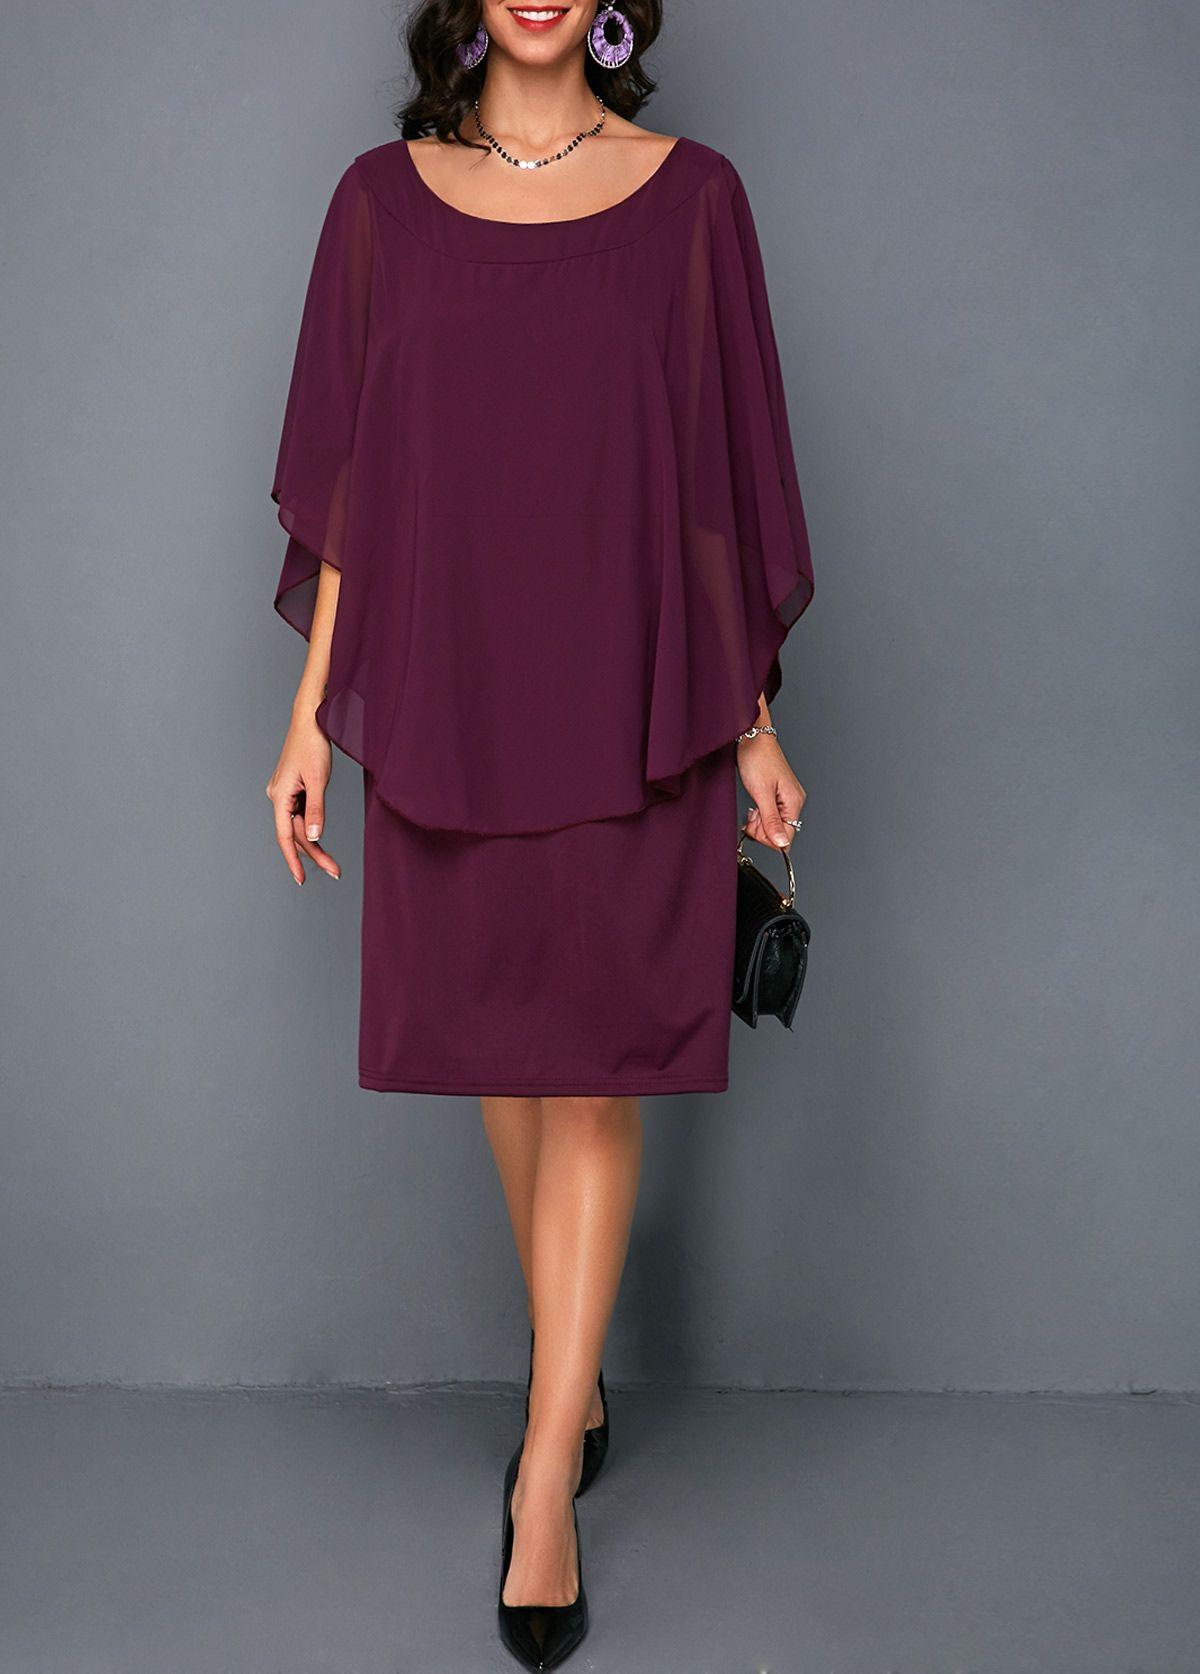 e07f4a45321 Round Neck Overlay Embellished Burgundy Chiffon Dress